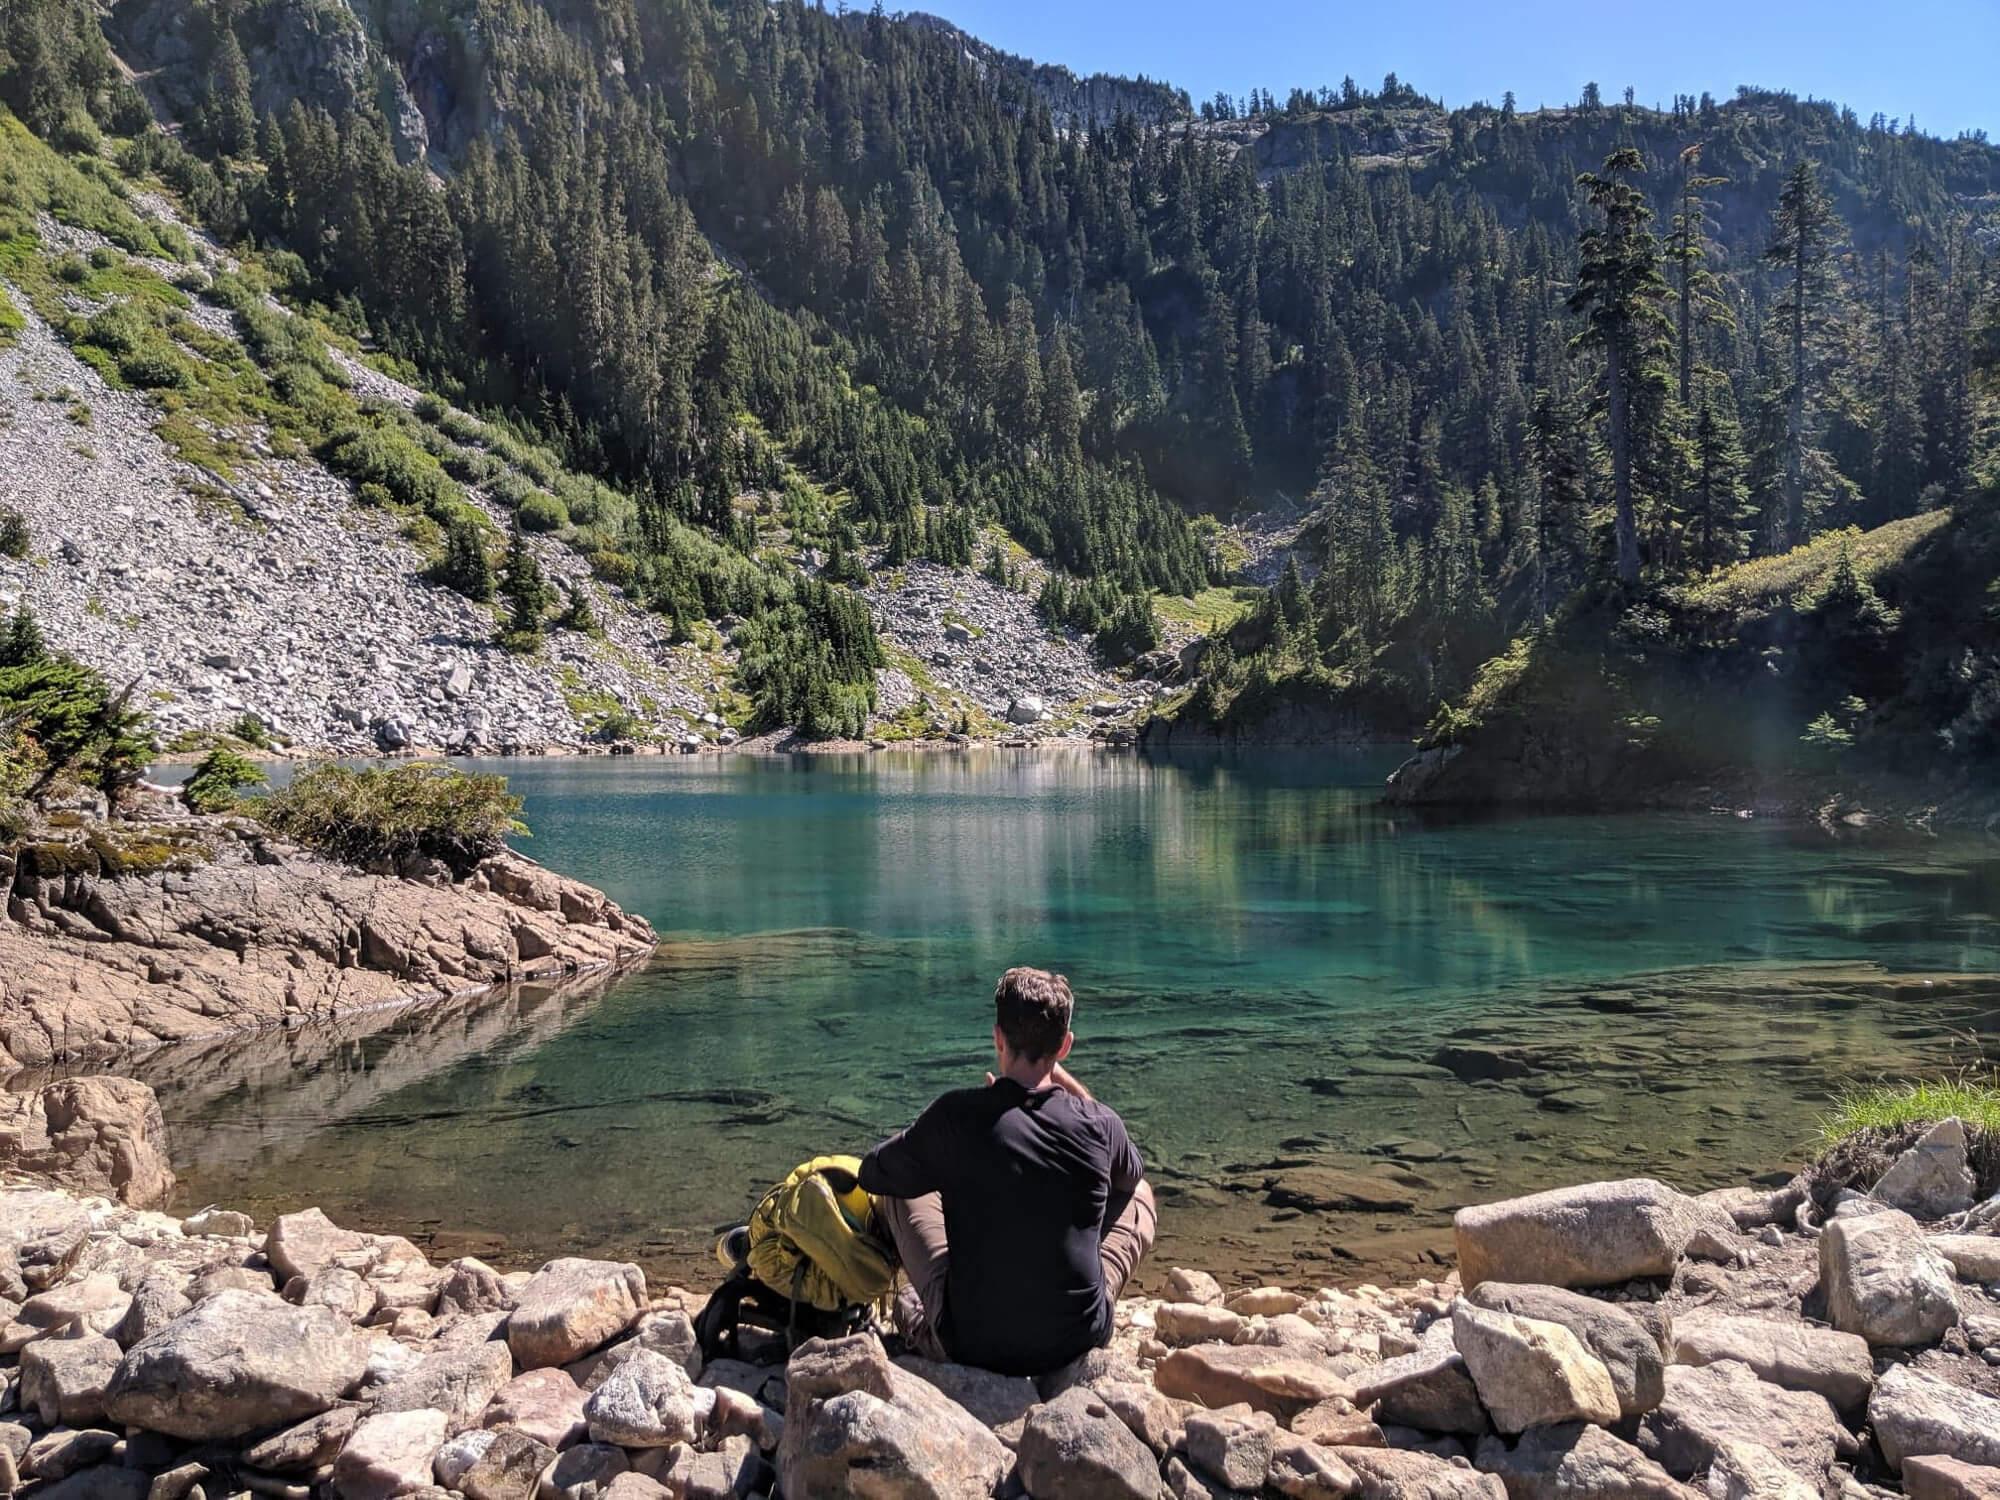 Brunswick lake the perfect spot for a swim